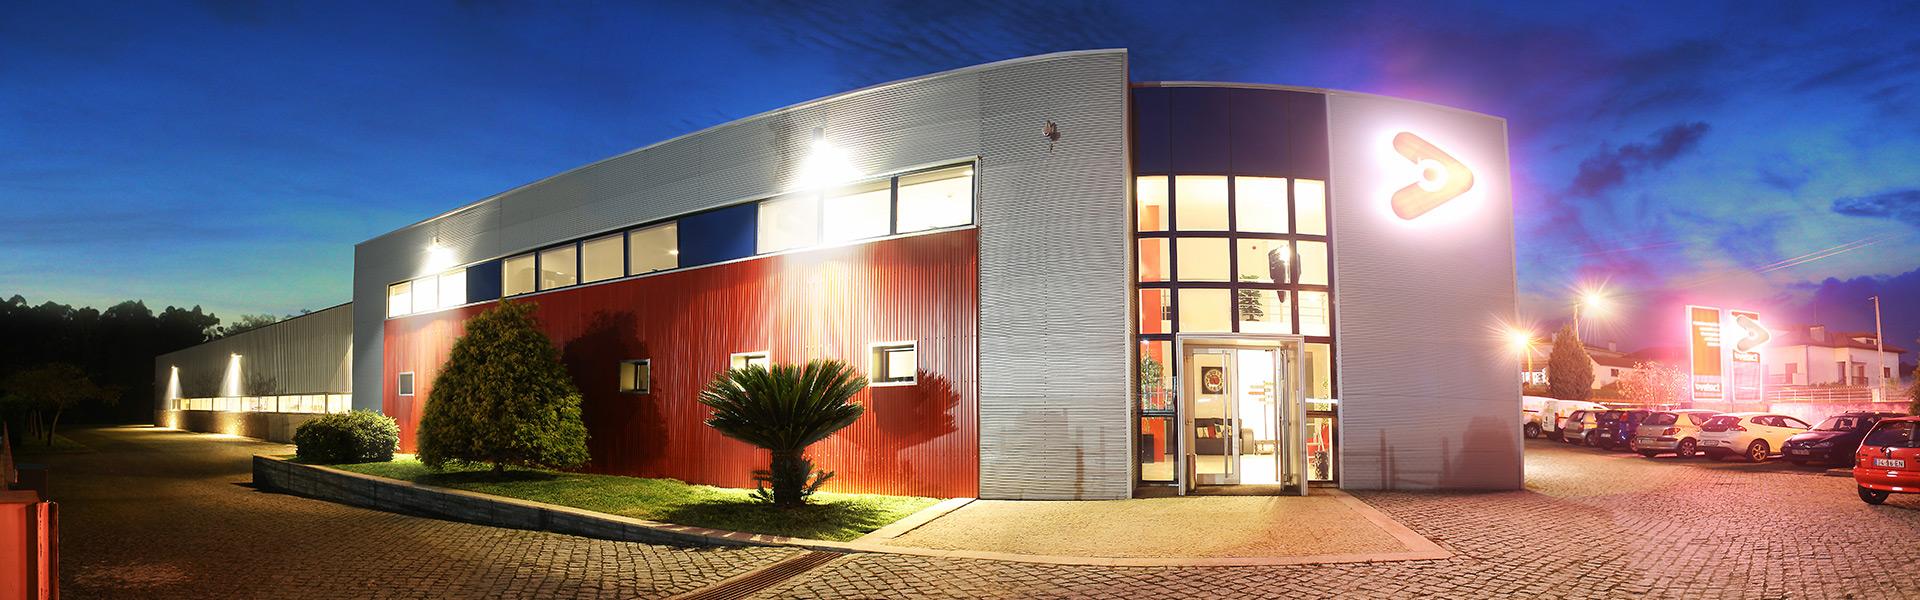 edificio_bystart_noite